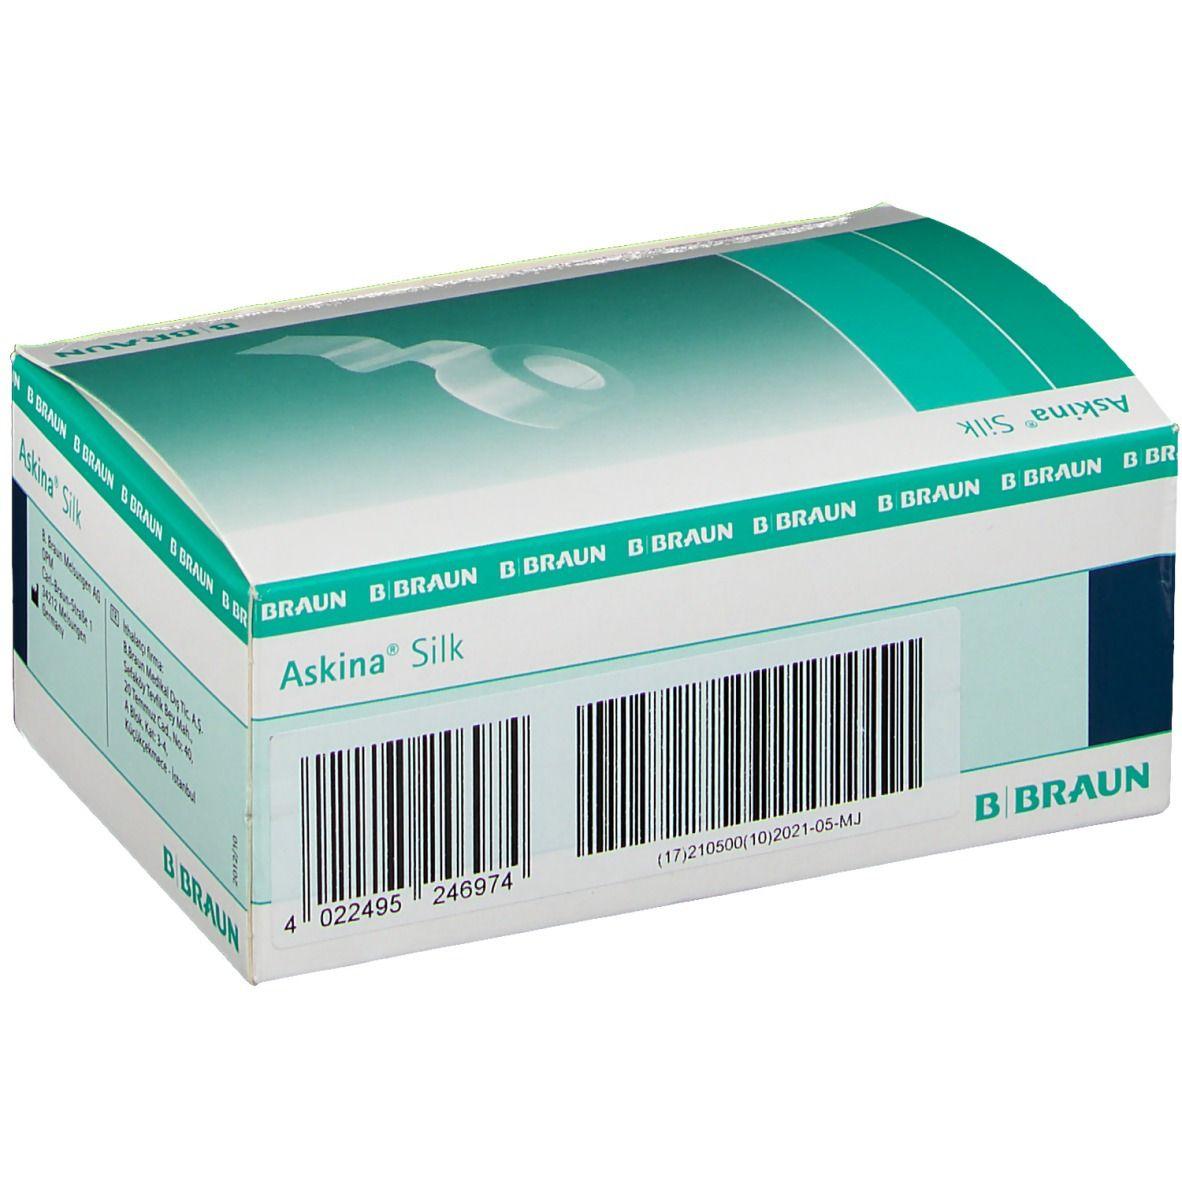 Askina® Silk Seidenpflaster 5 m x 2,5 cm